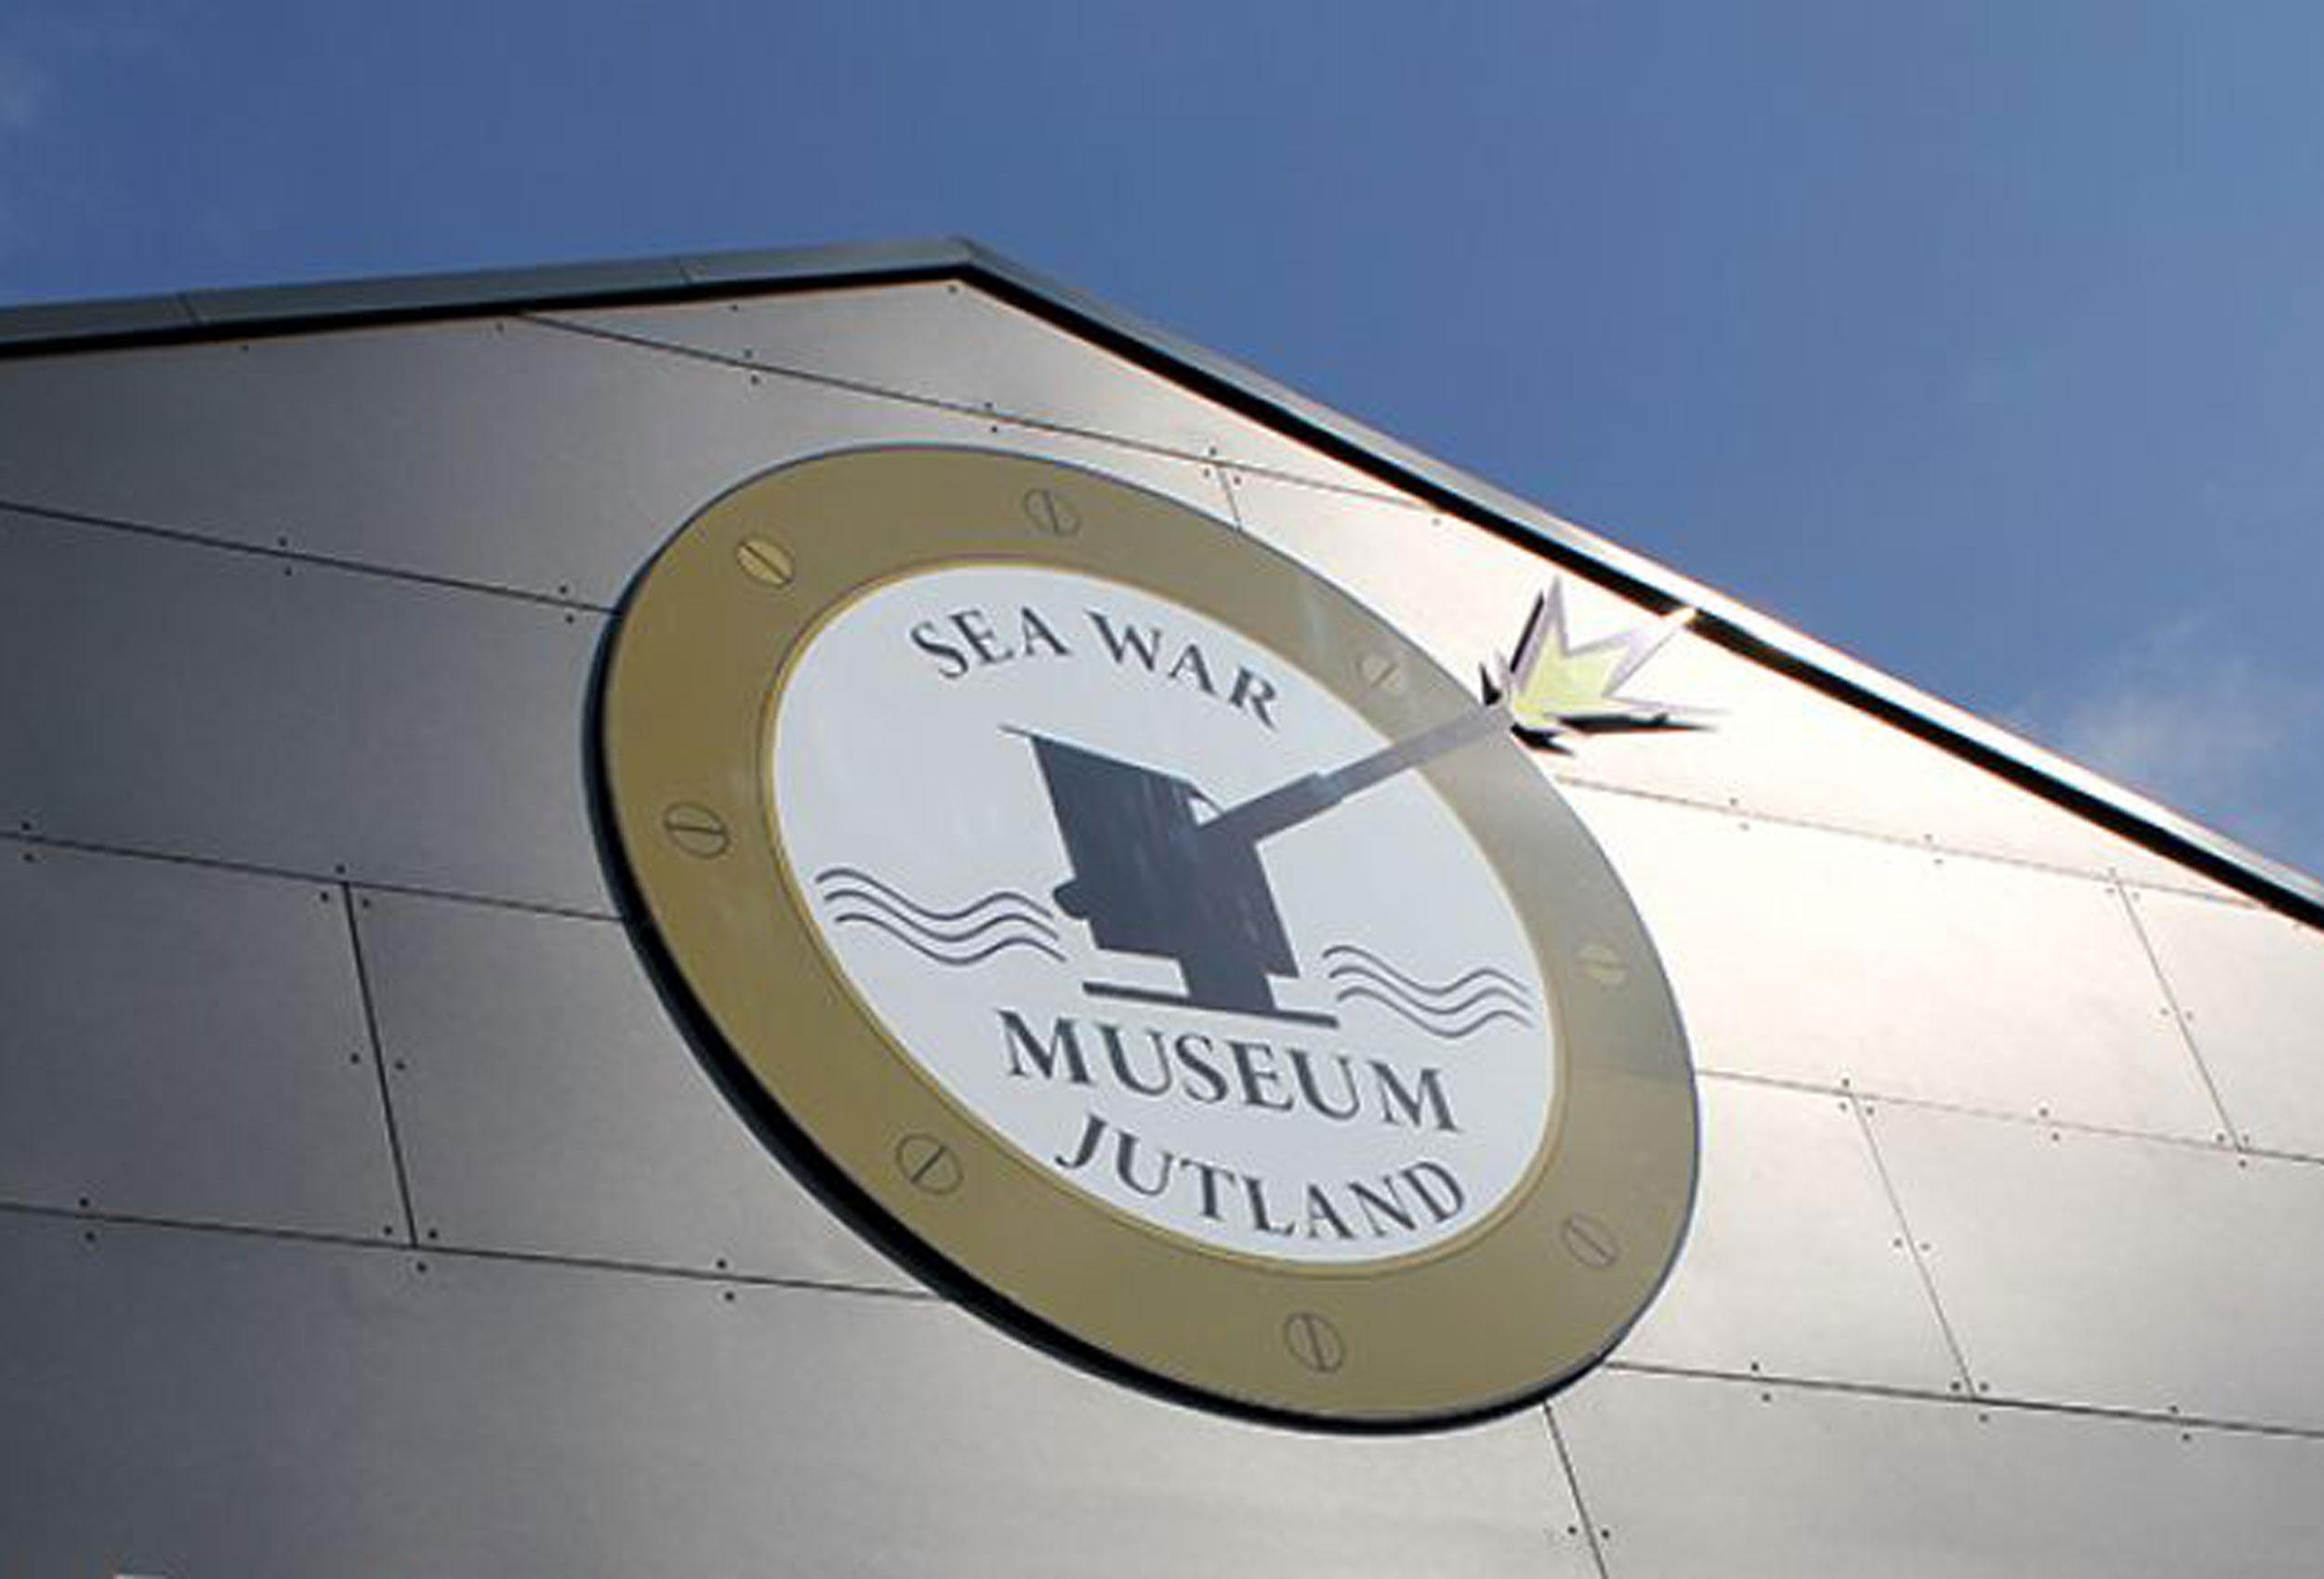 Sea War Museum Jutland